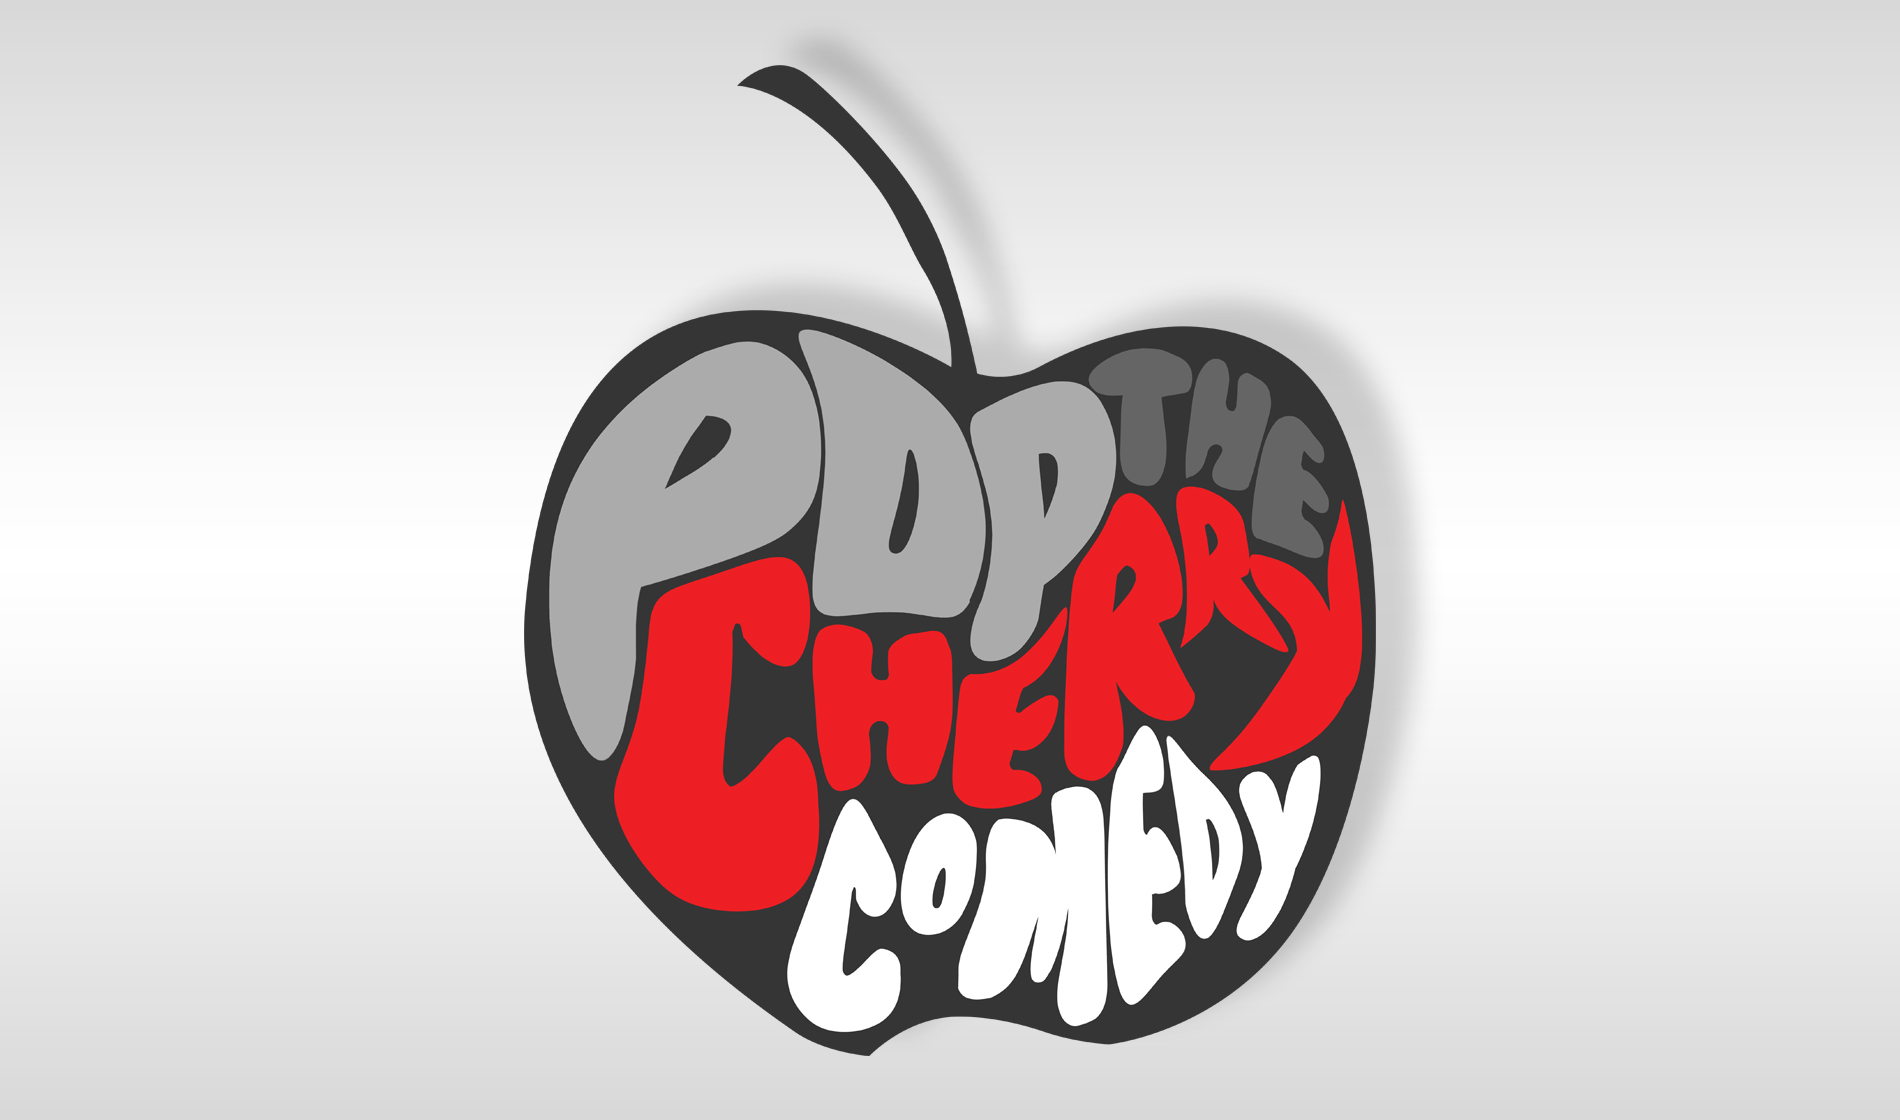 Cherry clipart pop art. The comedy logo duane